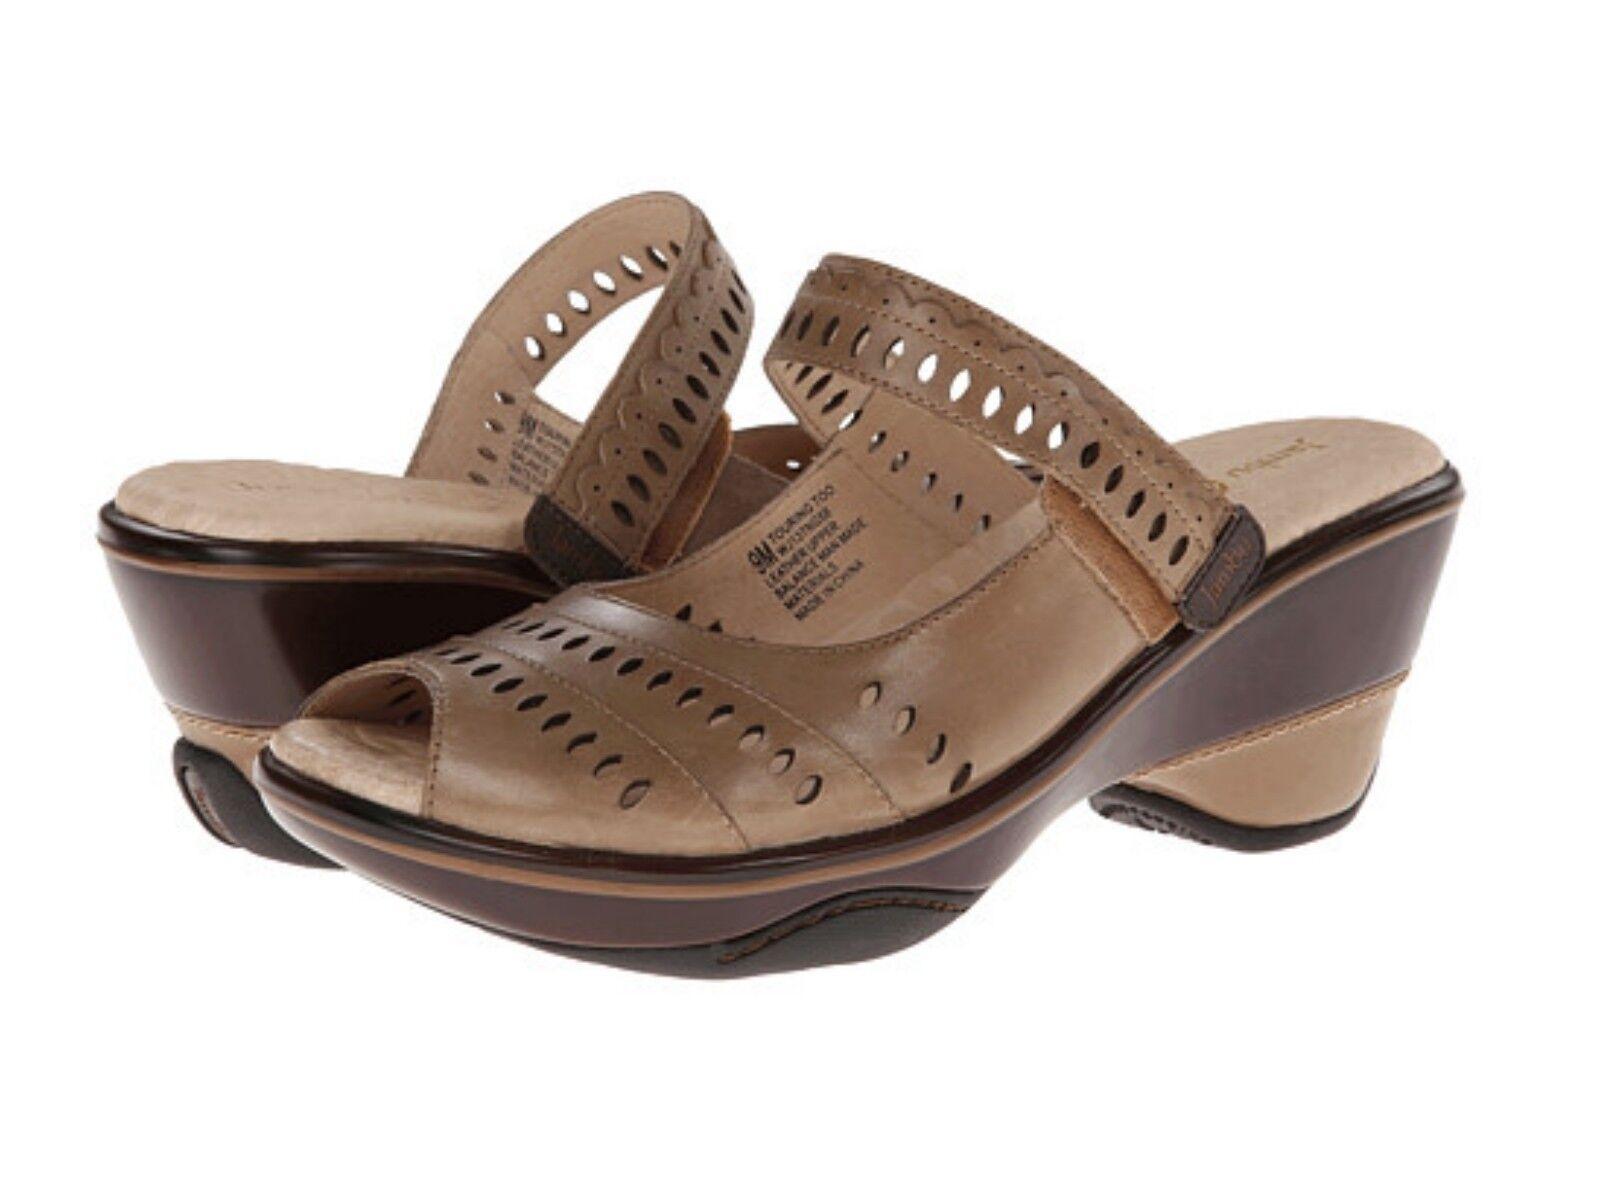 nuovo stile New donna donna donna Marrone Jambu Touring Too Wedge  Heel Peep Toe Sandal scarpe 7.5 8 9 10 11  sport caldi